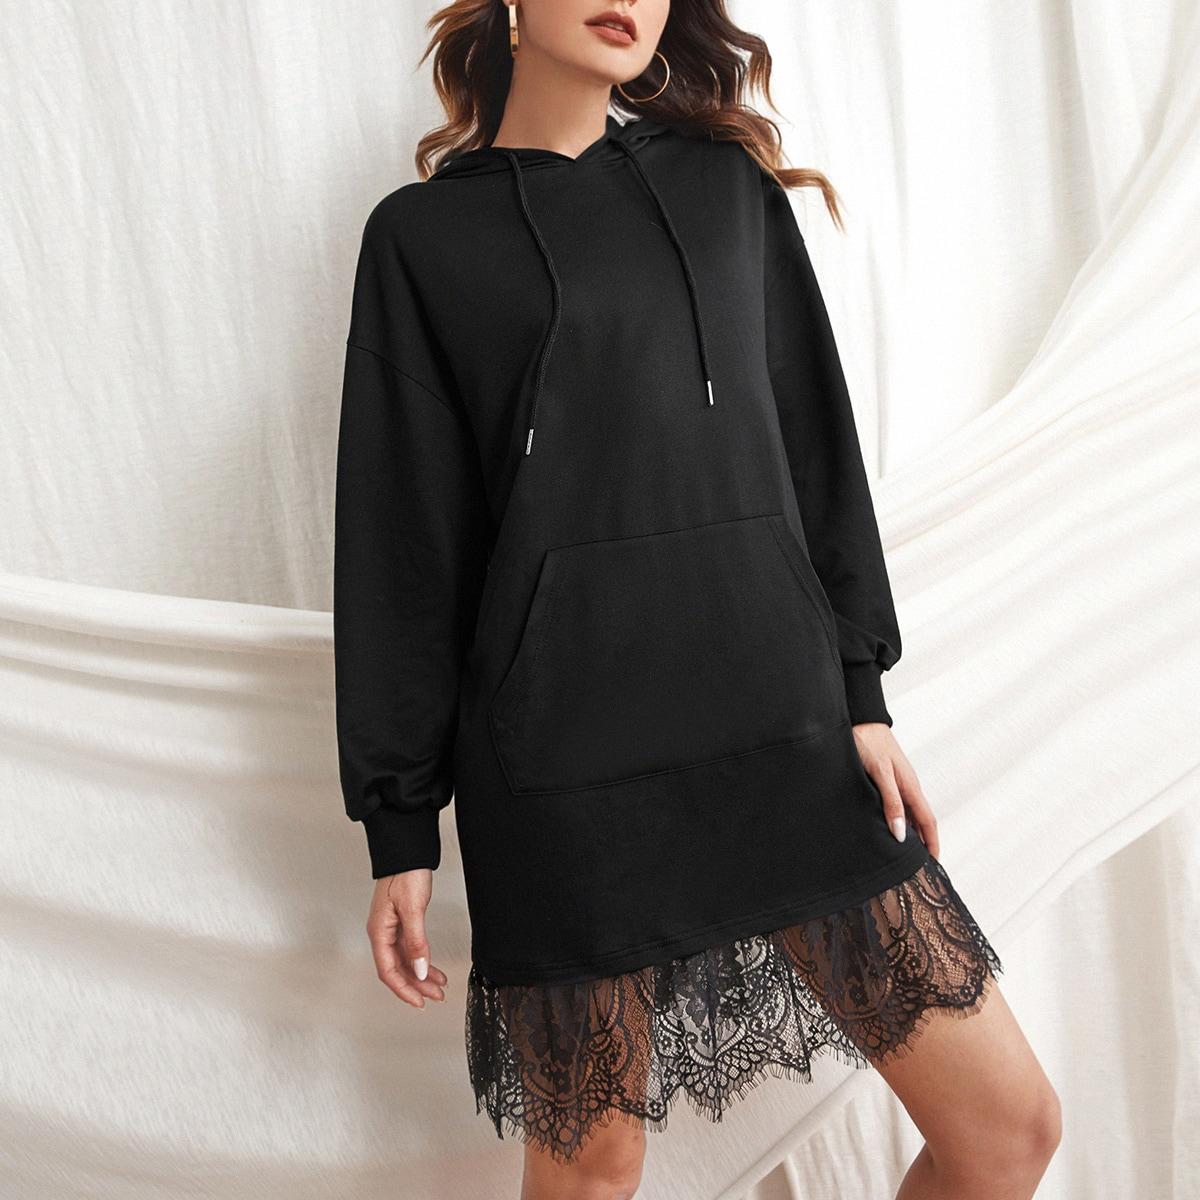 Lace Hem Kangaroo Pocket Sweatshirt Dress